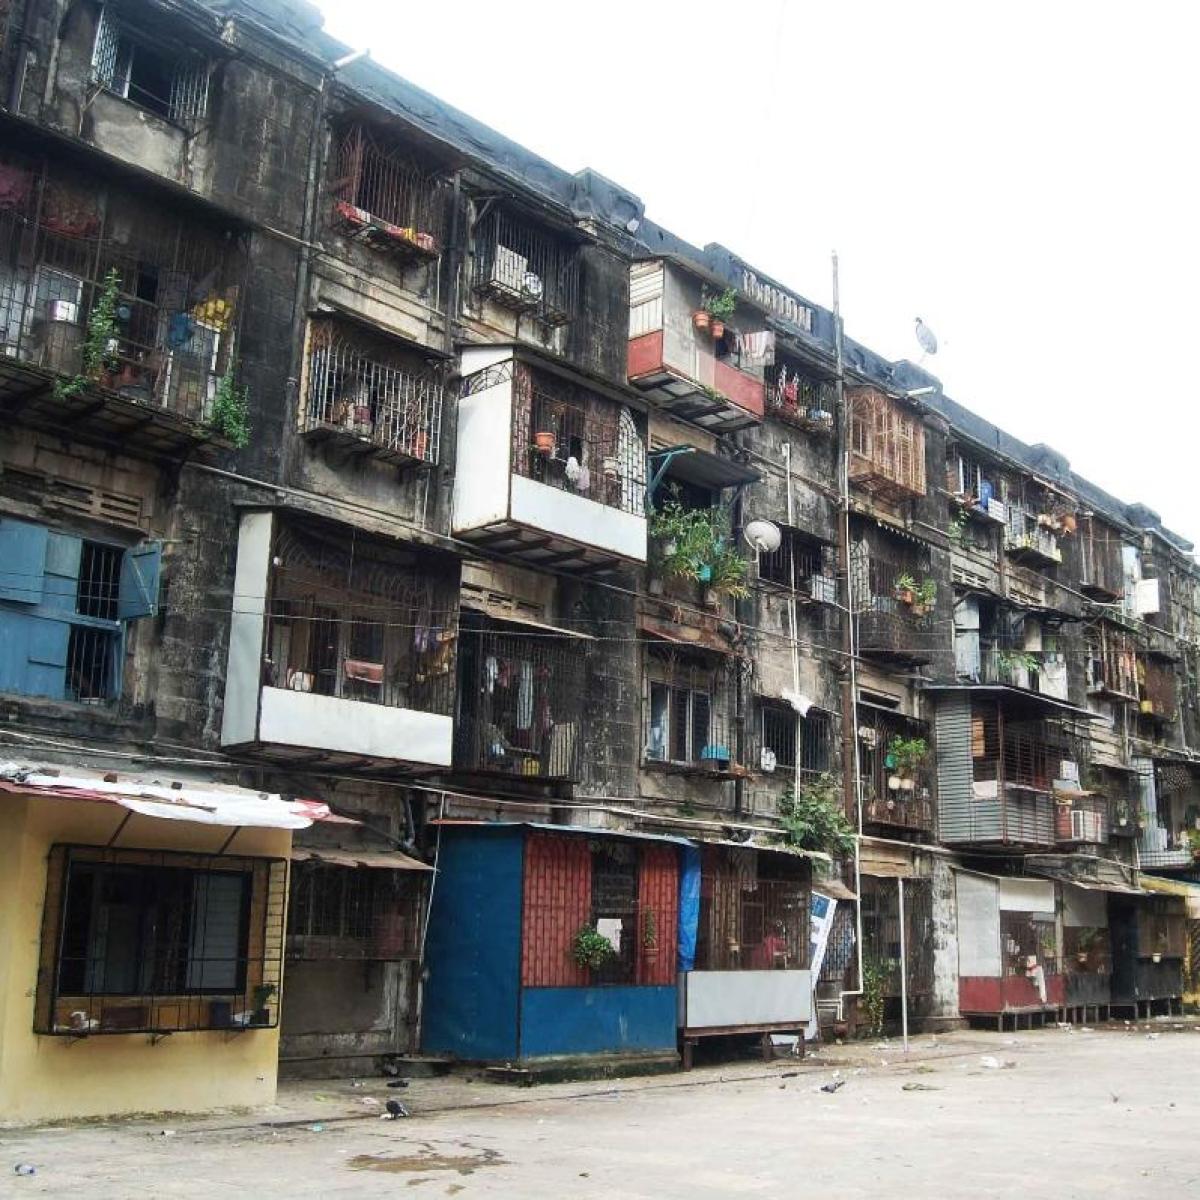 Resume survey, create confidence among tenants: MHADA on Mumbai's BDD Chawl redevelopment work